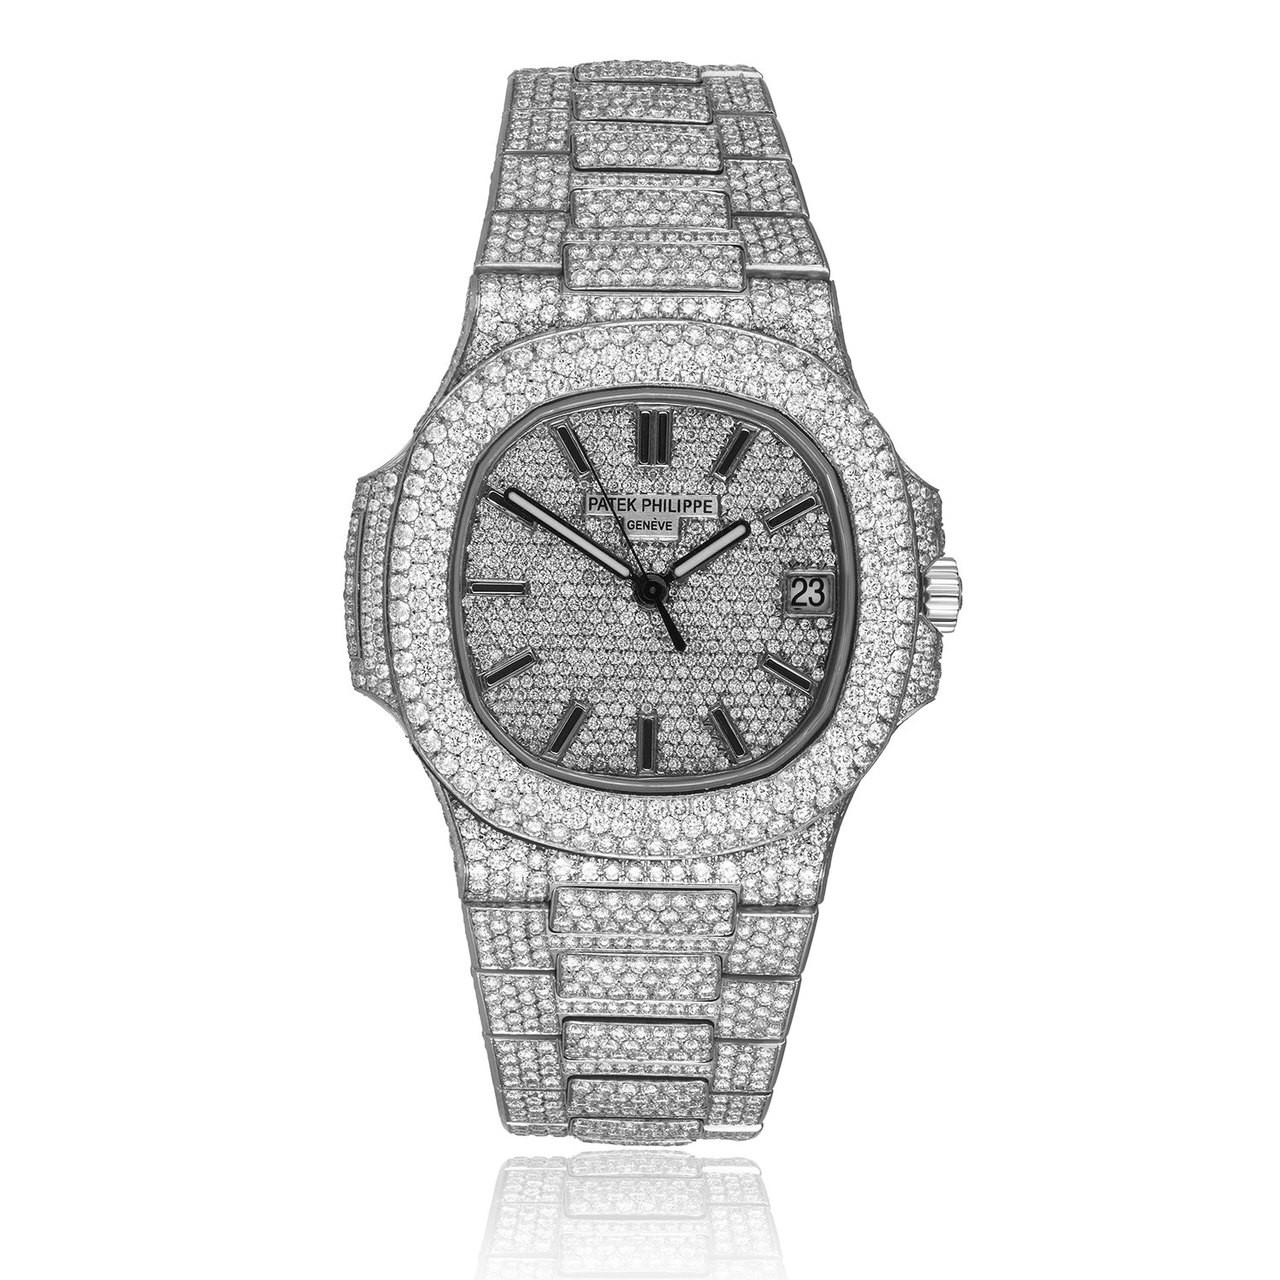 Patek Philippe Nautilus 5711 1a Stainless Steel 23 5ct Diamond Watch